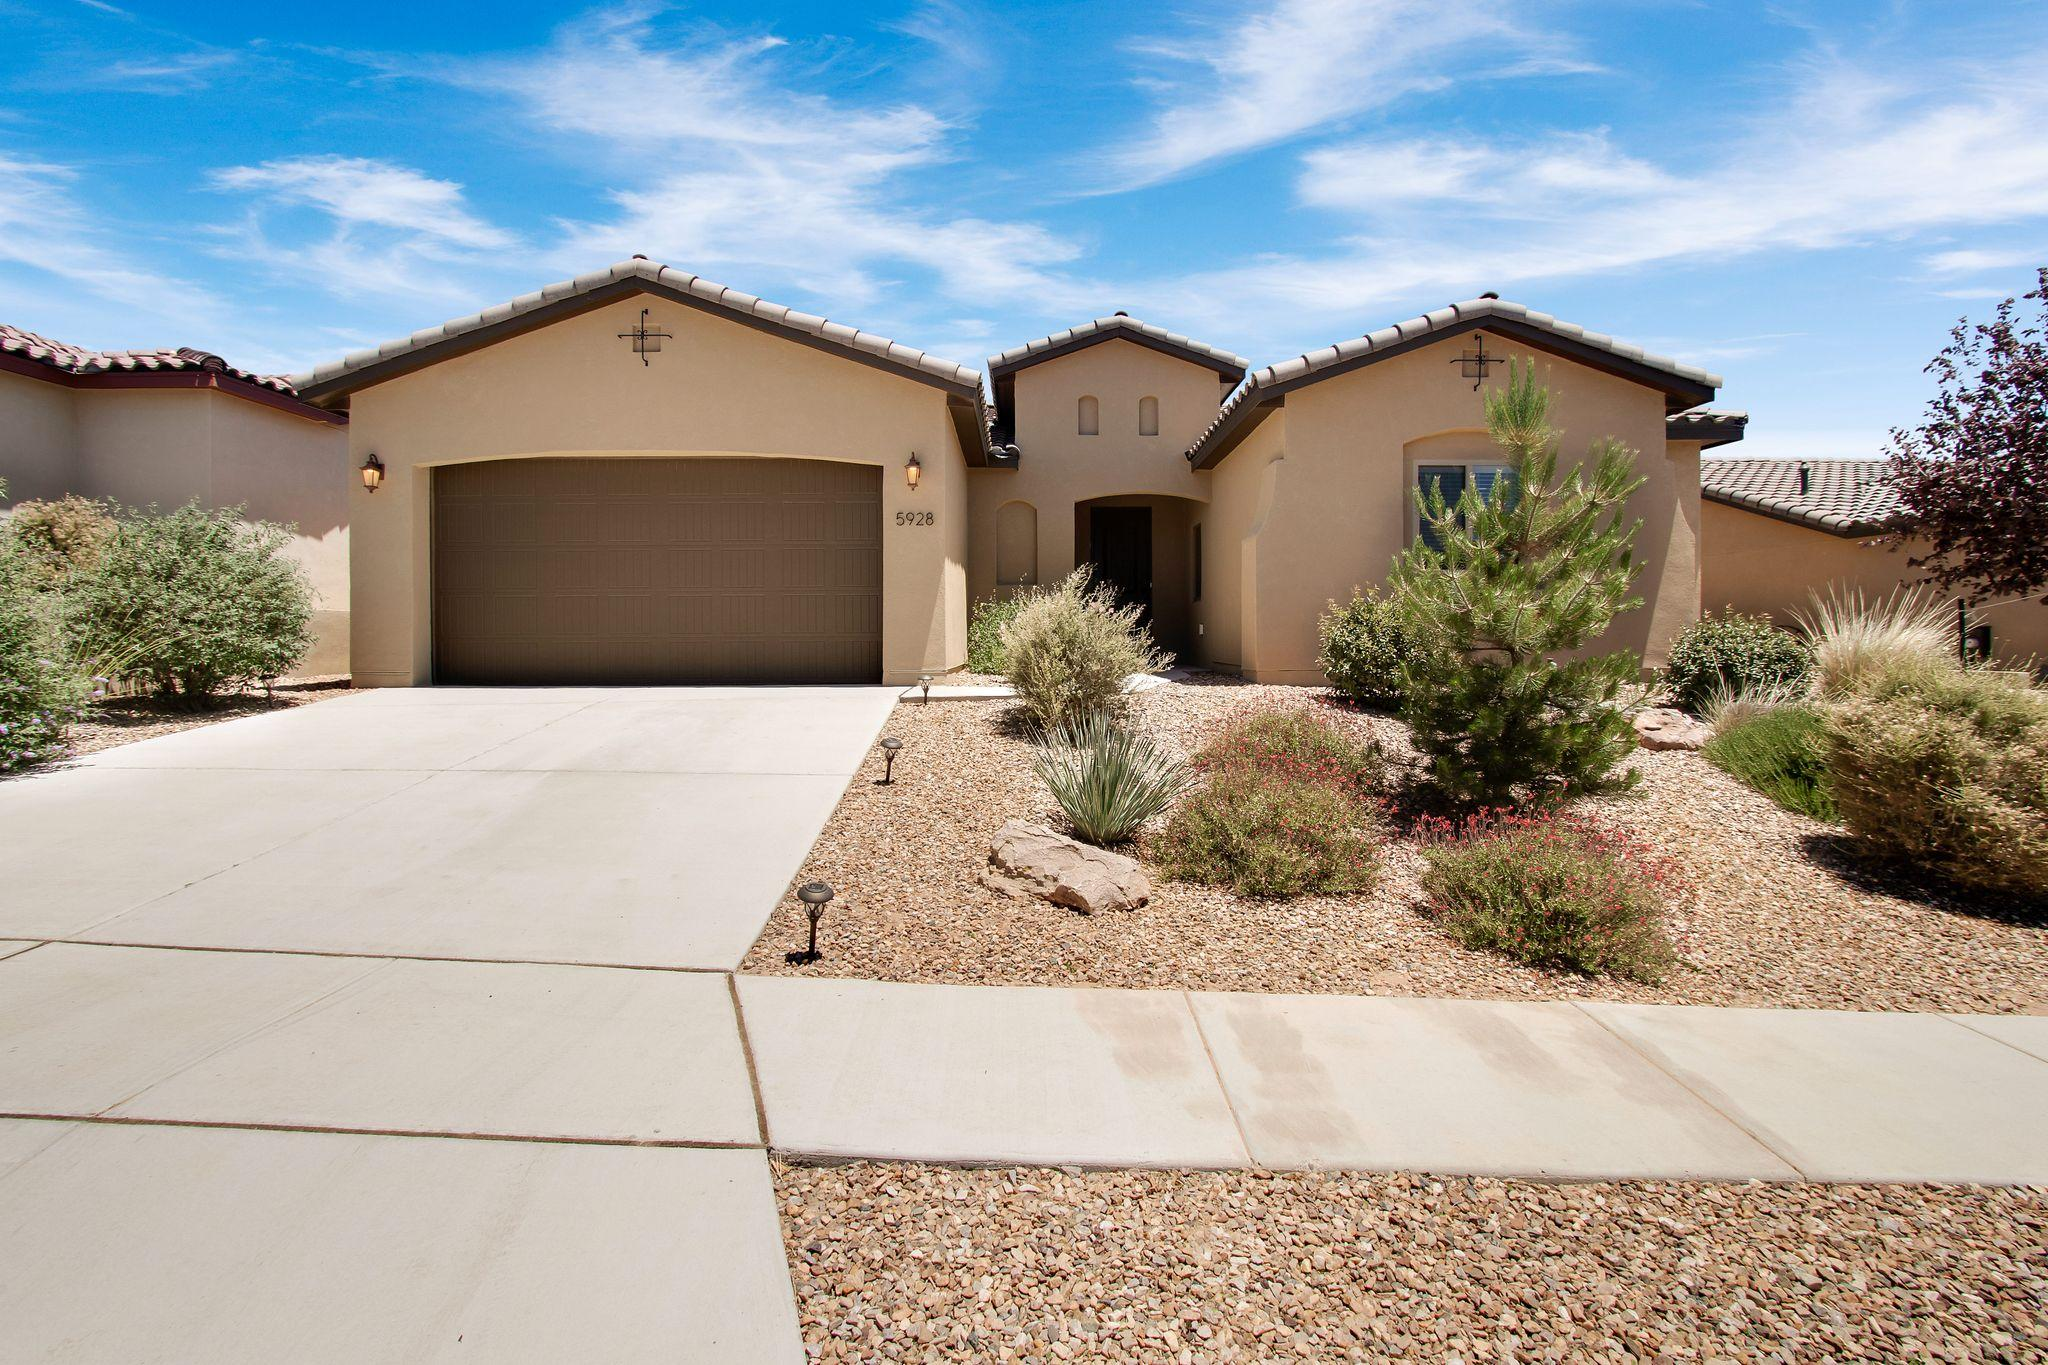 5928 S SANDIA Court NE Property Photo - Rio Rancho, NM real estate listing